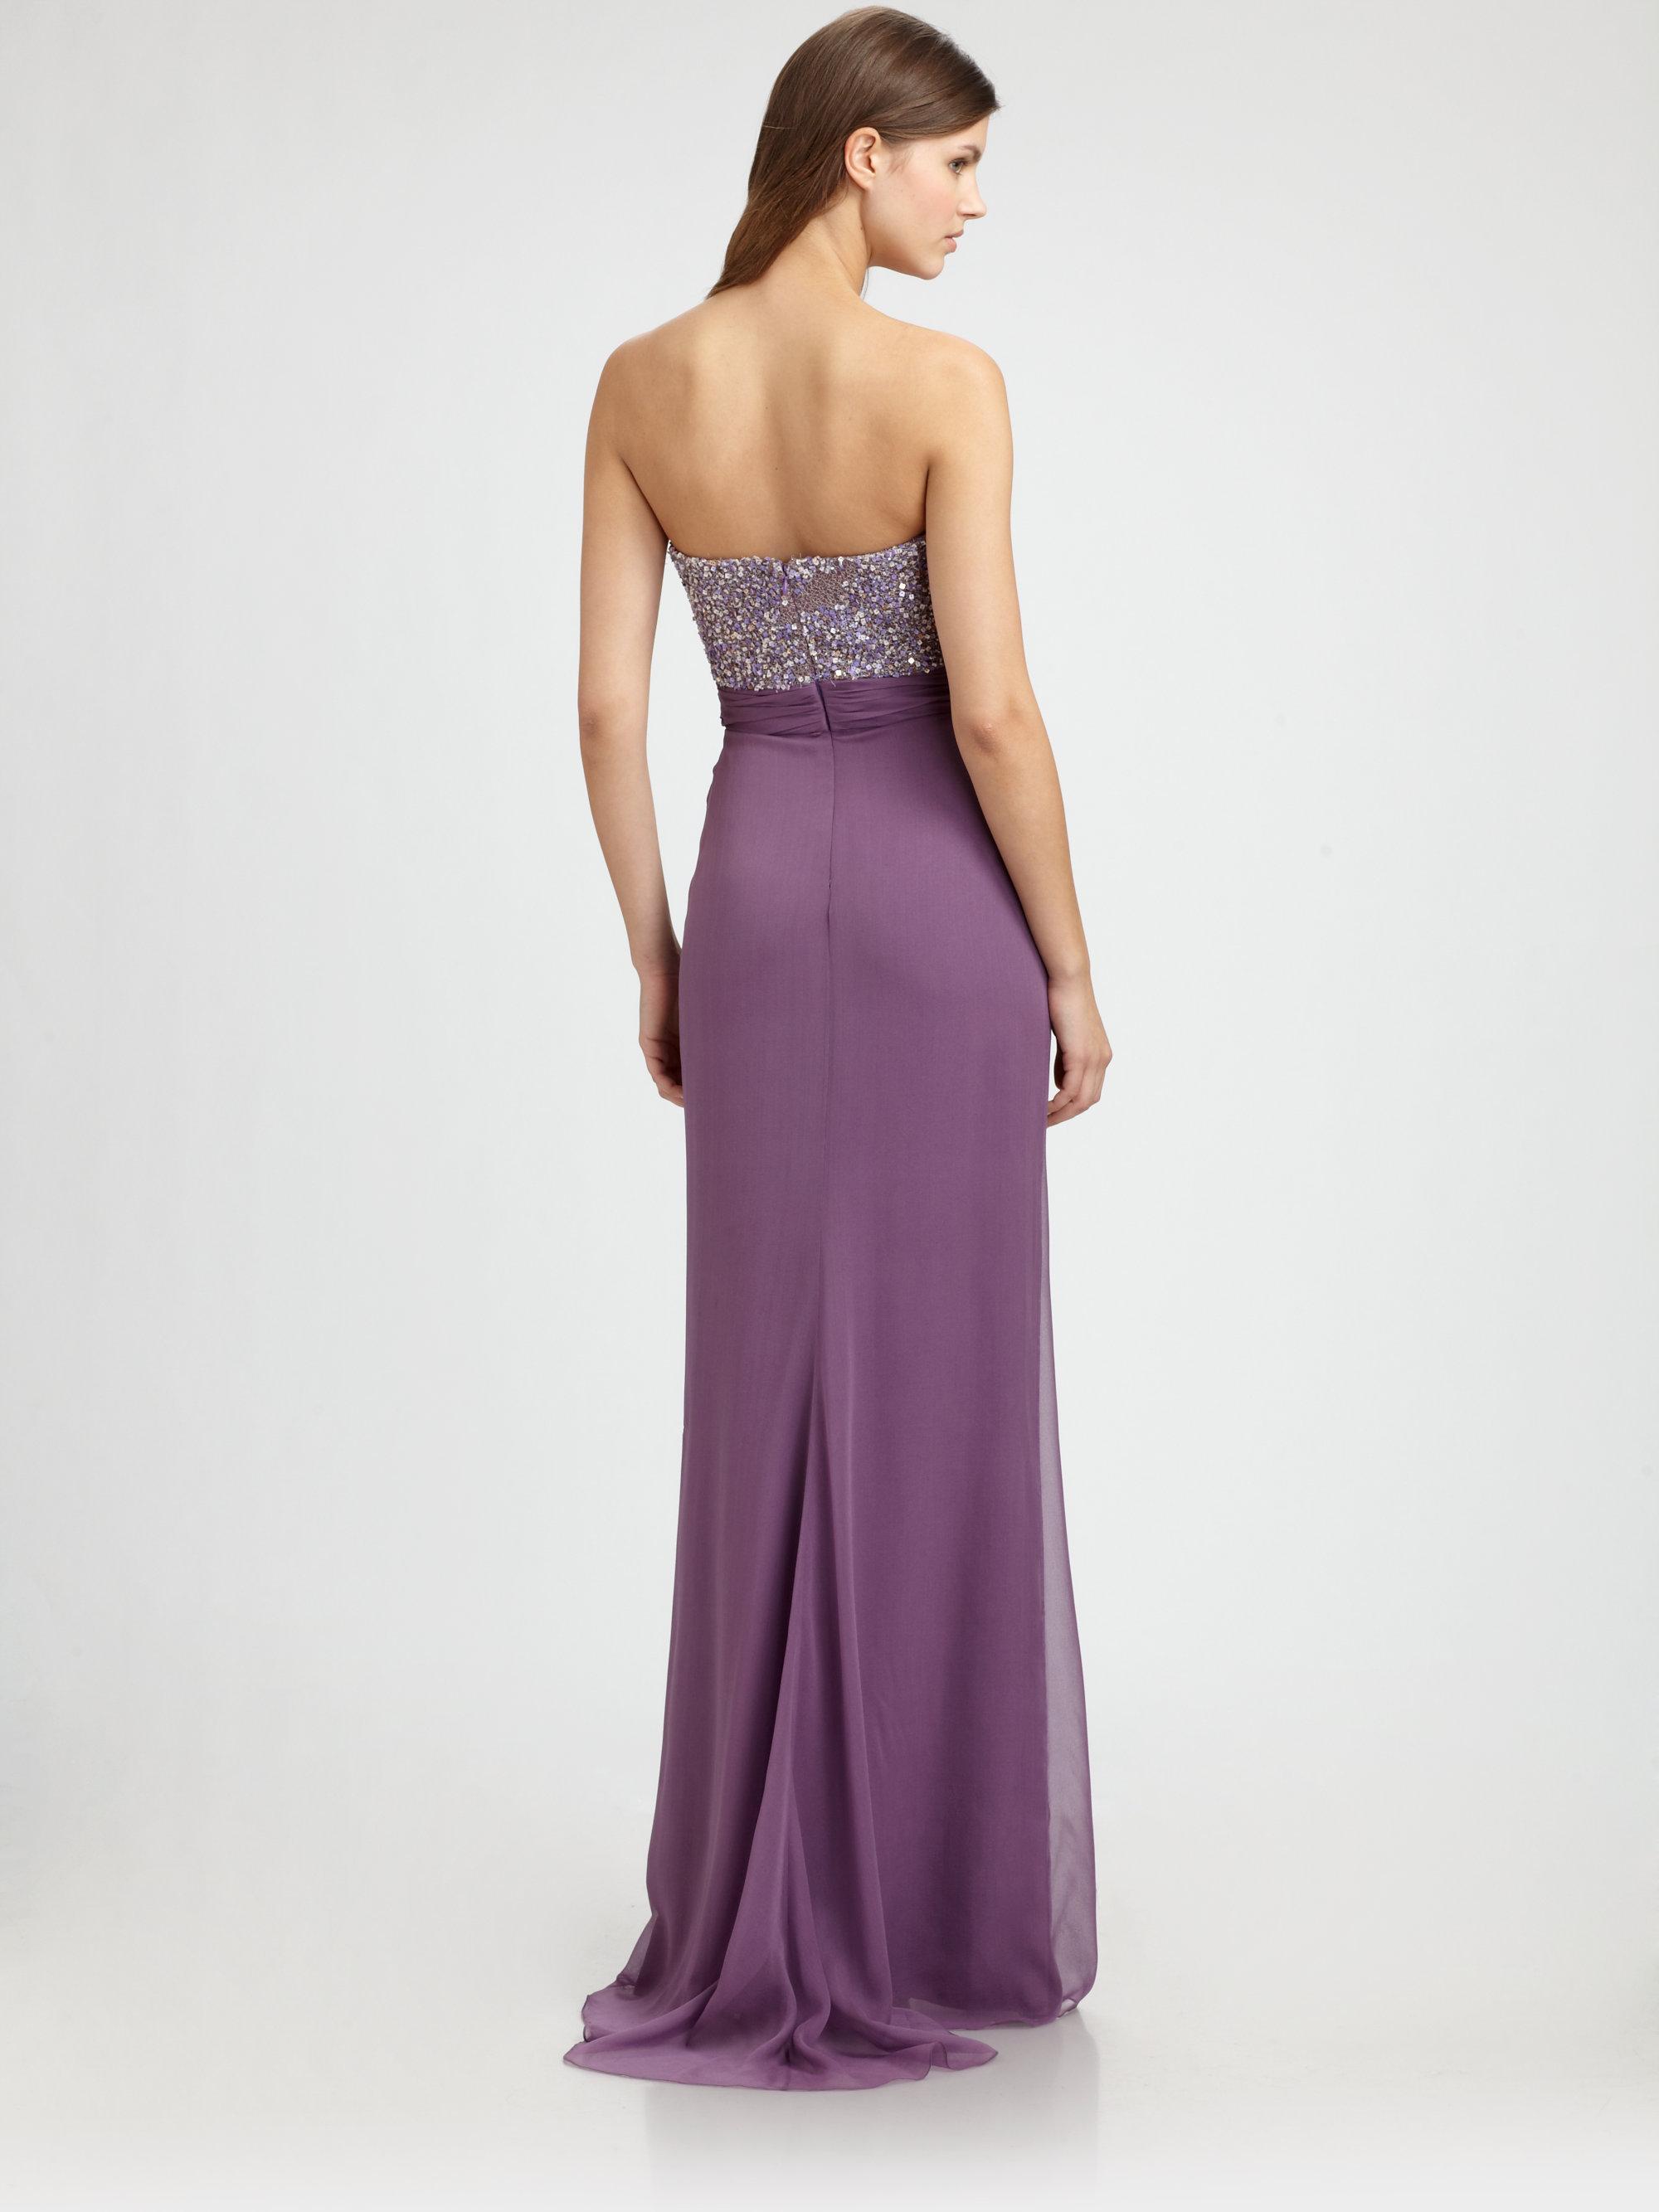 Lyst - Badgley Mischka Beaded Silk Gown in Purple